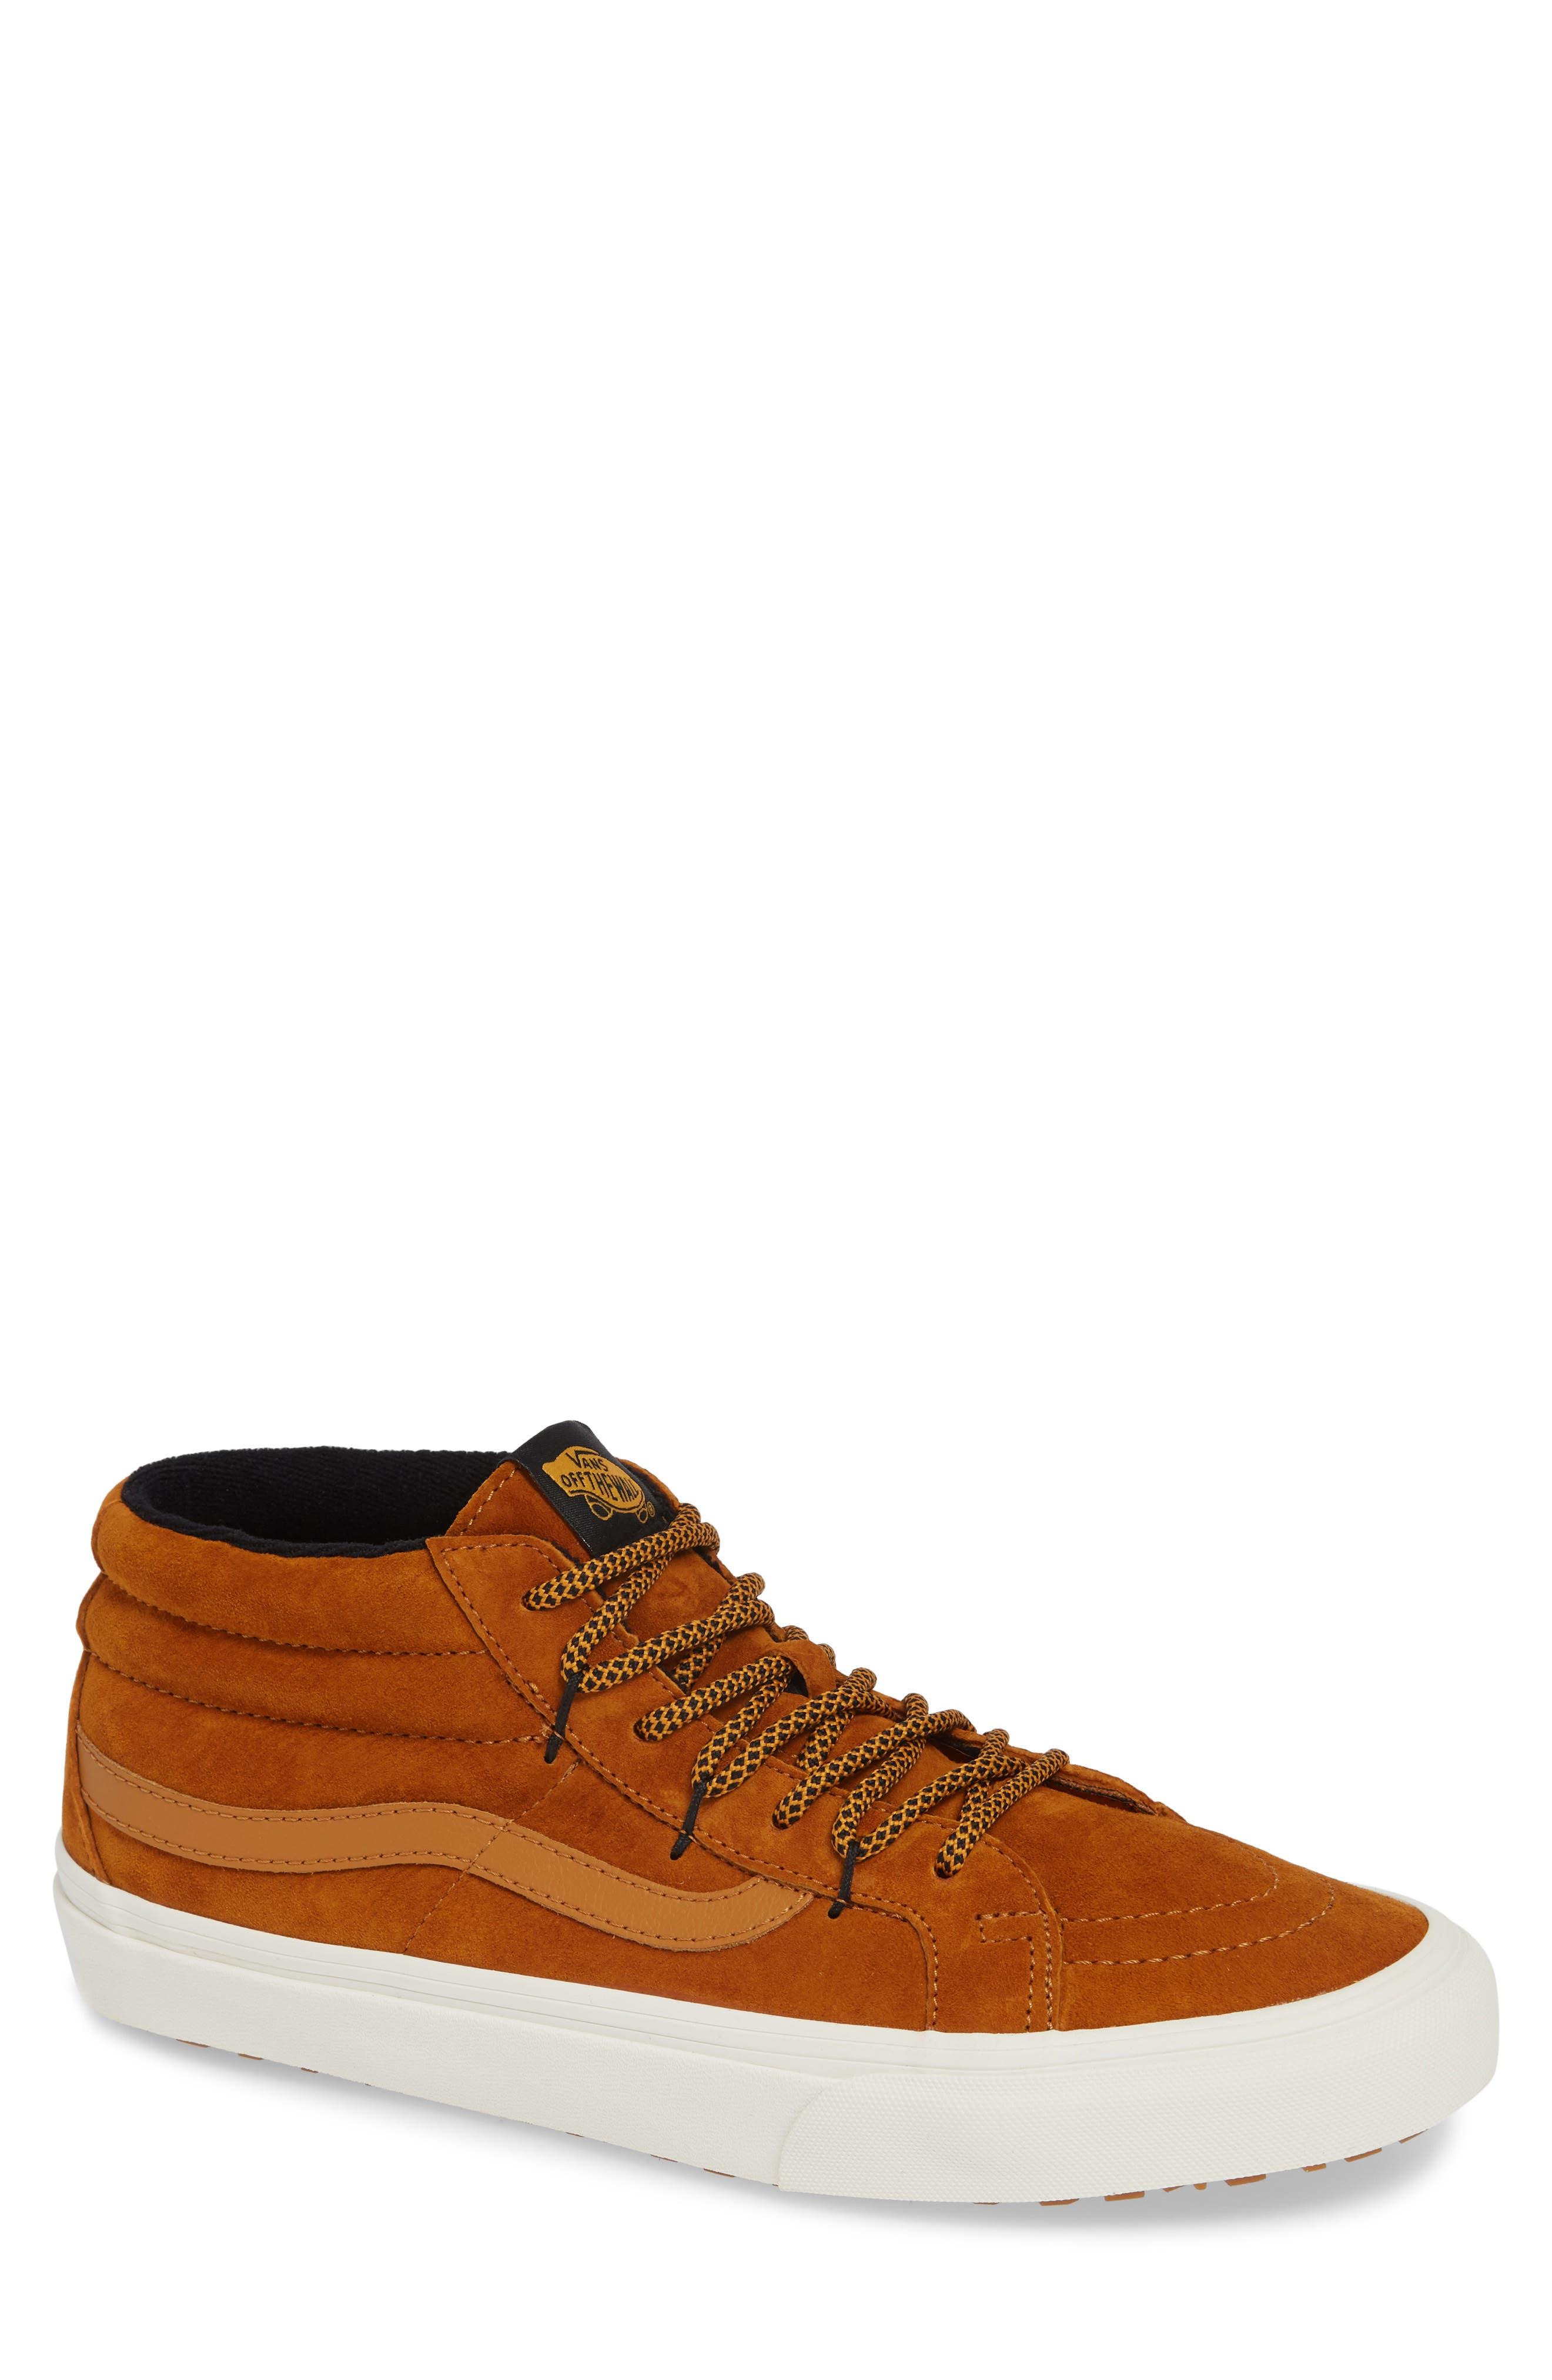 SK8-Hi Mid Reissue Ghillie MTE Sneaker,                             Main thumbnail 1, color,                             BROWN/ MARSHMALLOW